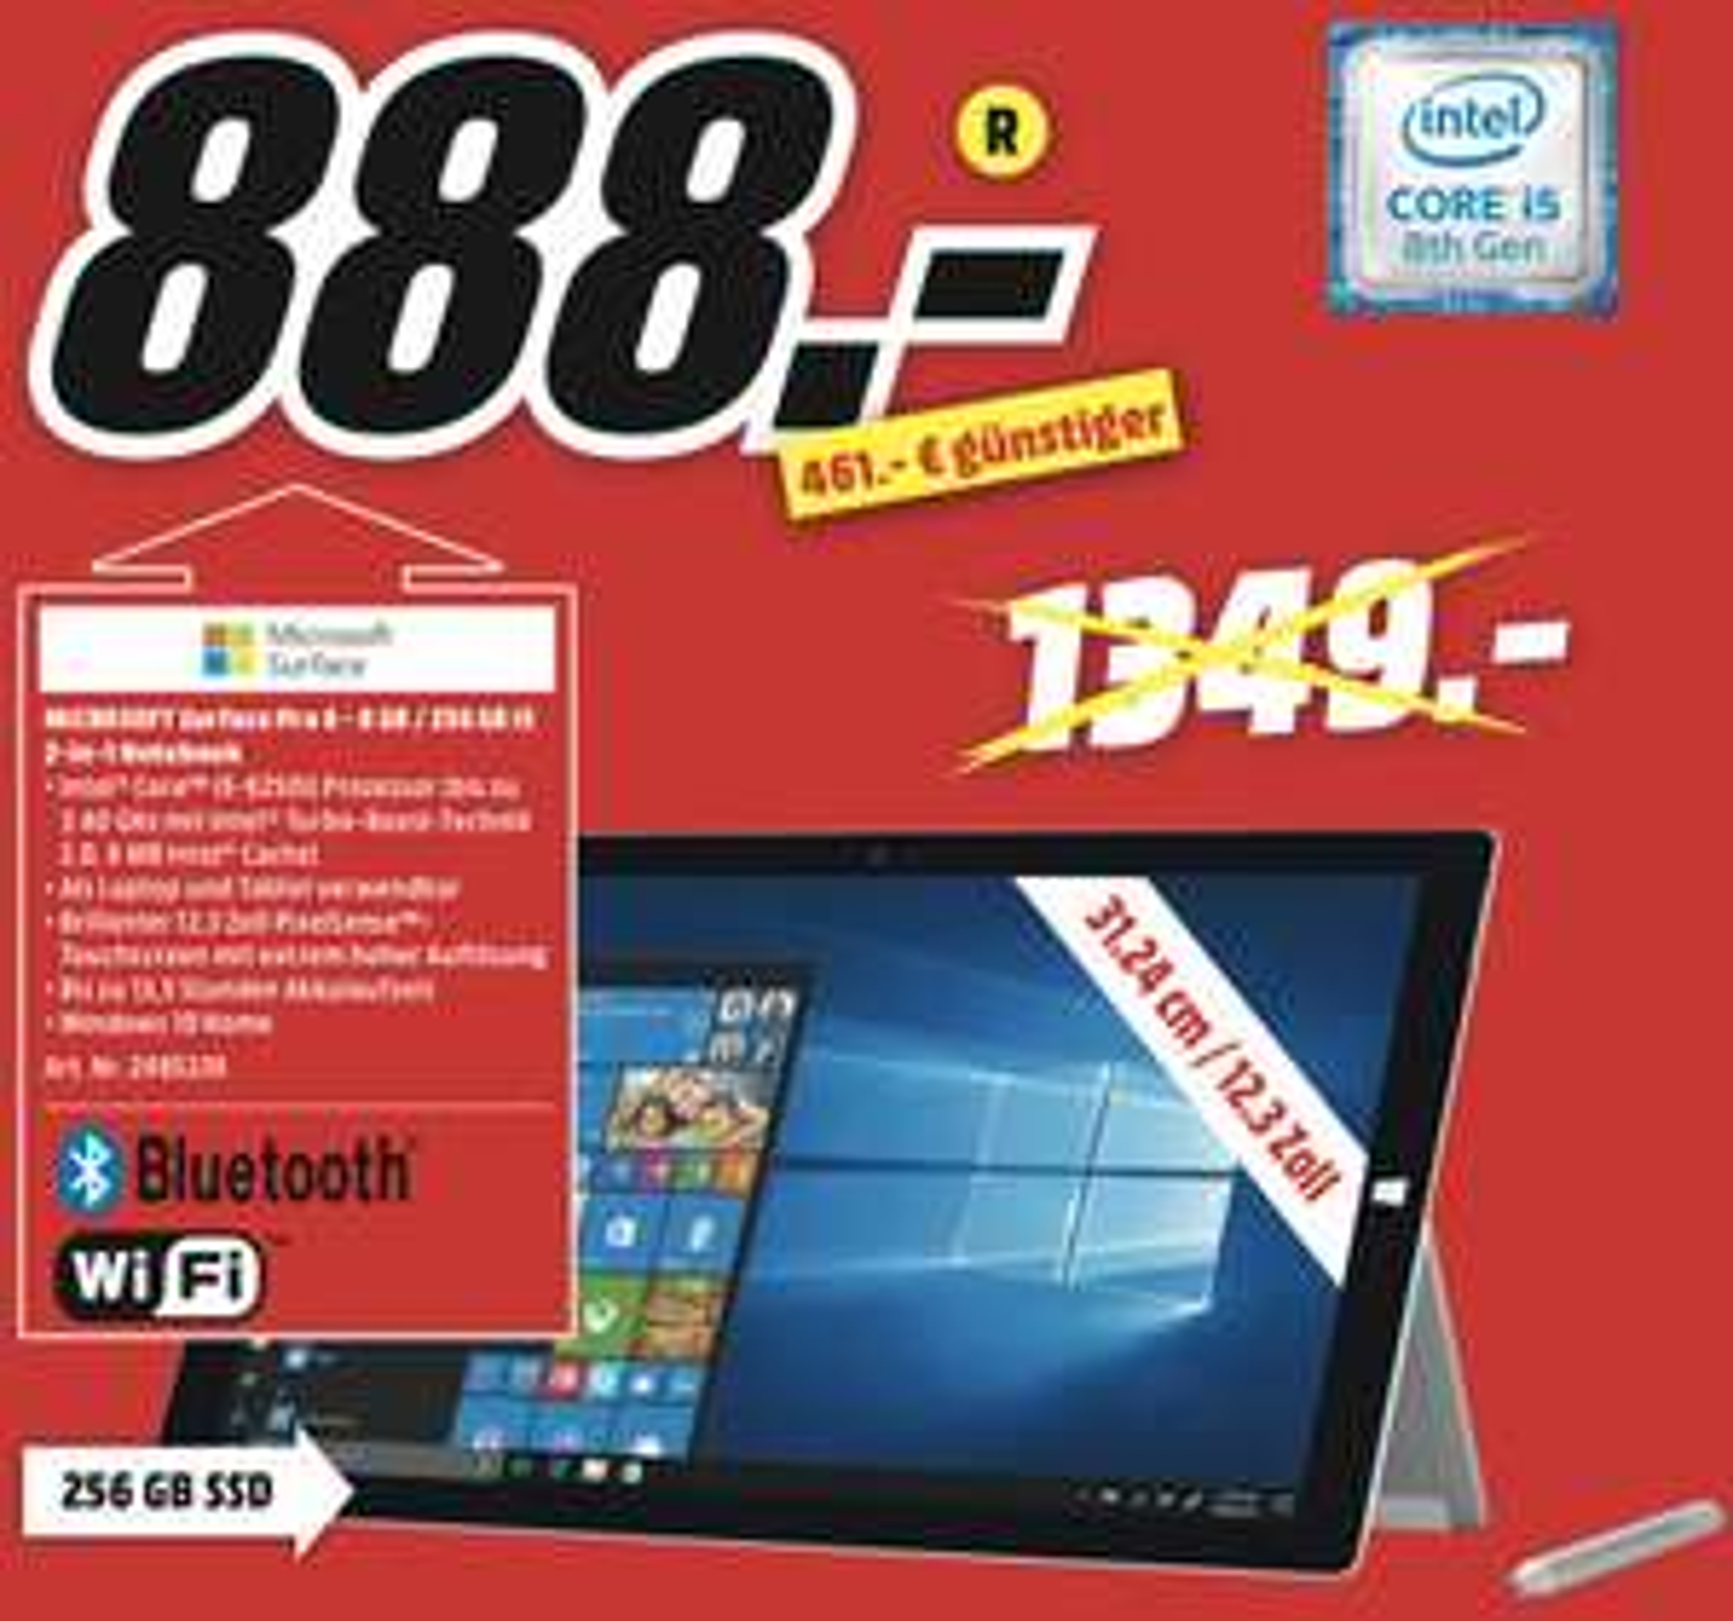 Lokal MediaMarkt Hameln: Microsoft Surface Pro 6 Core i5 8GB 256GB für 888€ / OK 40 Zoll 101cm Full-HD LED TV für 99€